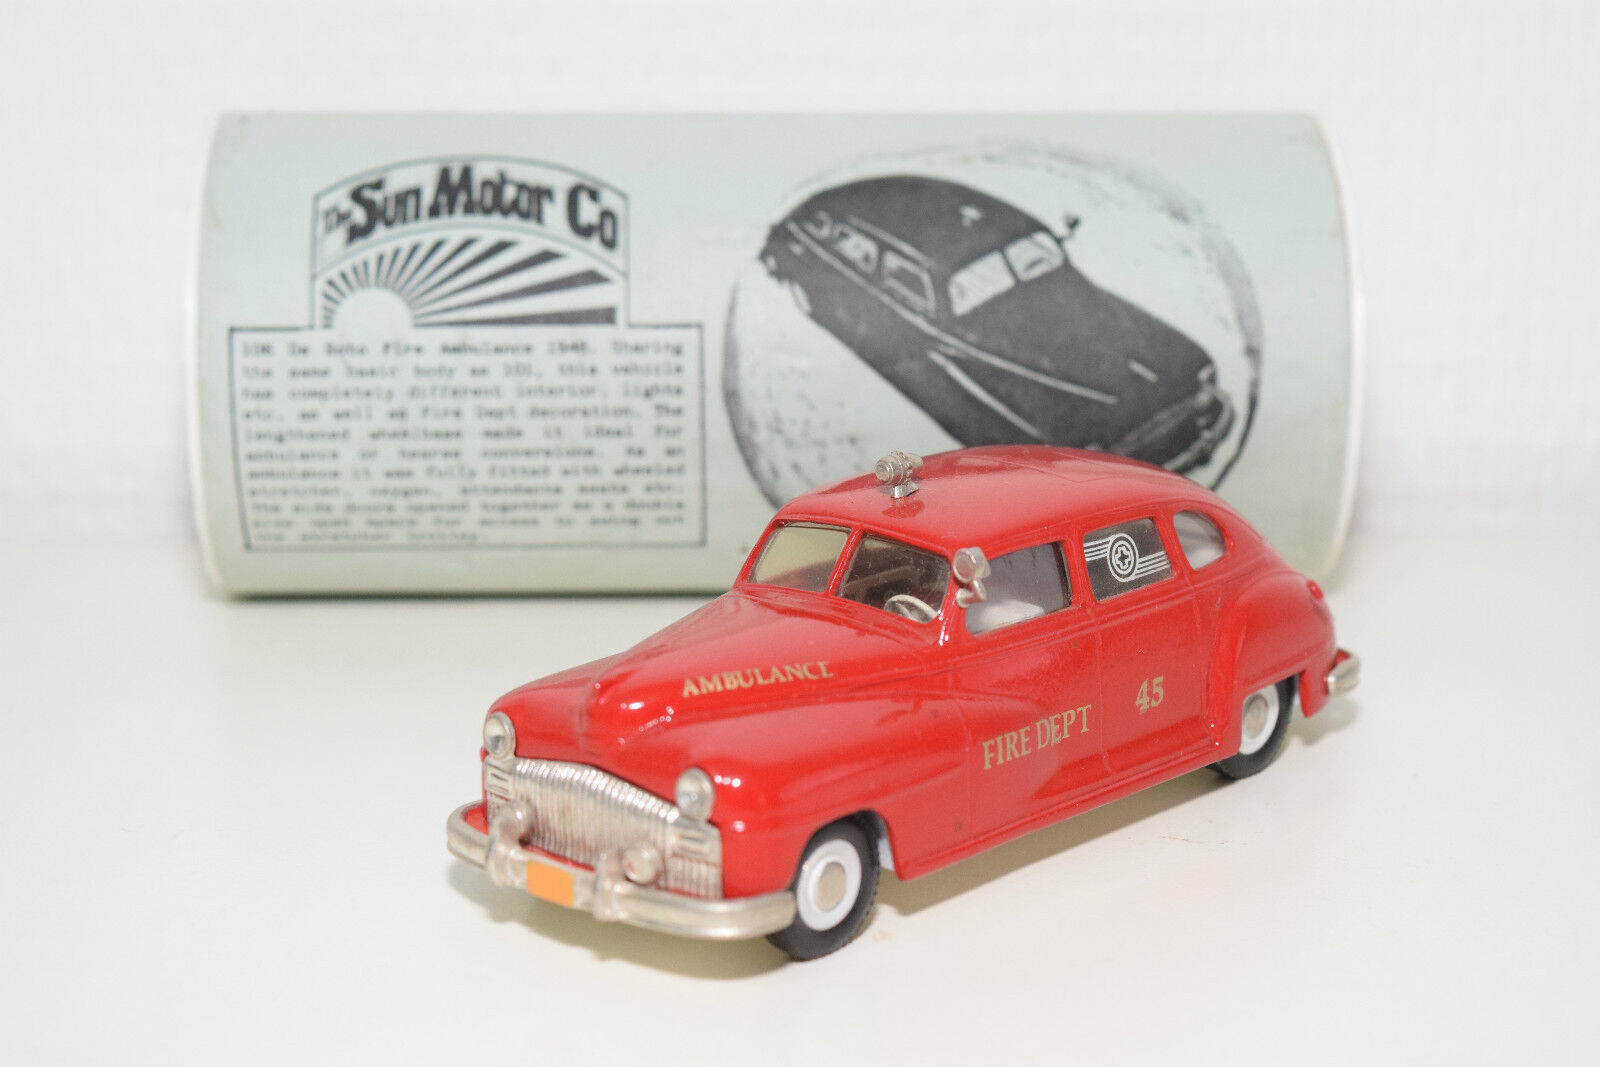 SUN MOTOR CO DE SOTO DESOTO FIRE AMBULANCE 1948 MINT BOXED